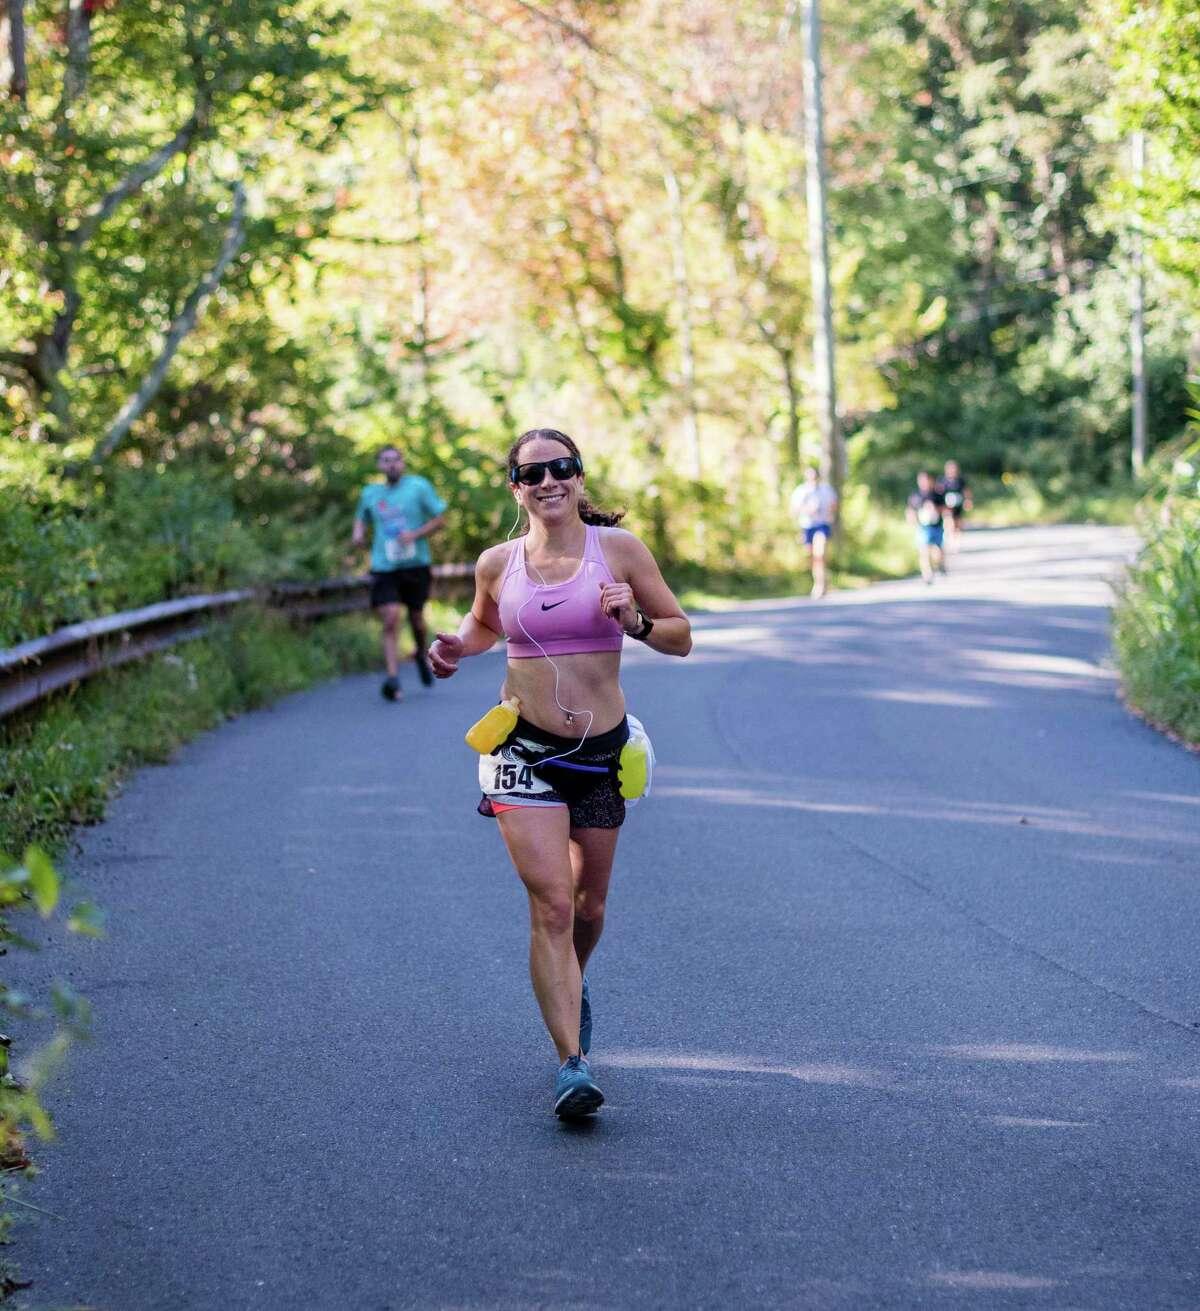 Sharon Rosenblatt competes in the Pamby Ridgefield Half Marathon last October. Rosenblatt is currently running or walking every street in Ridgefield.